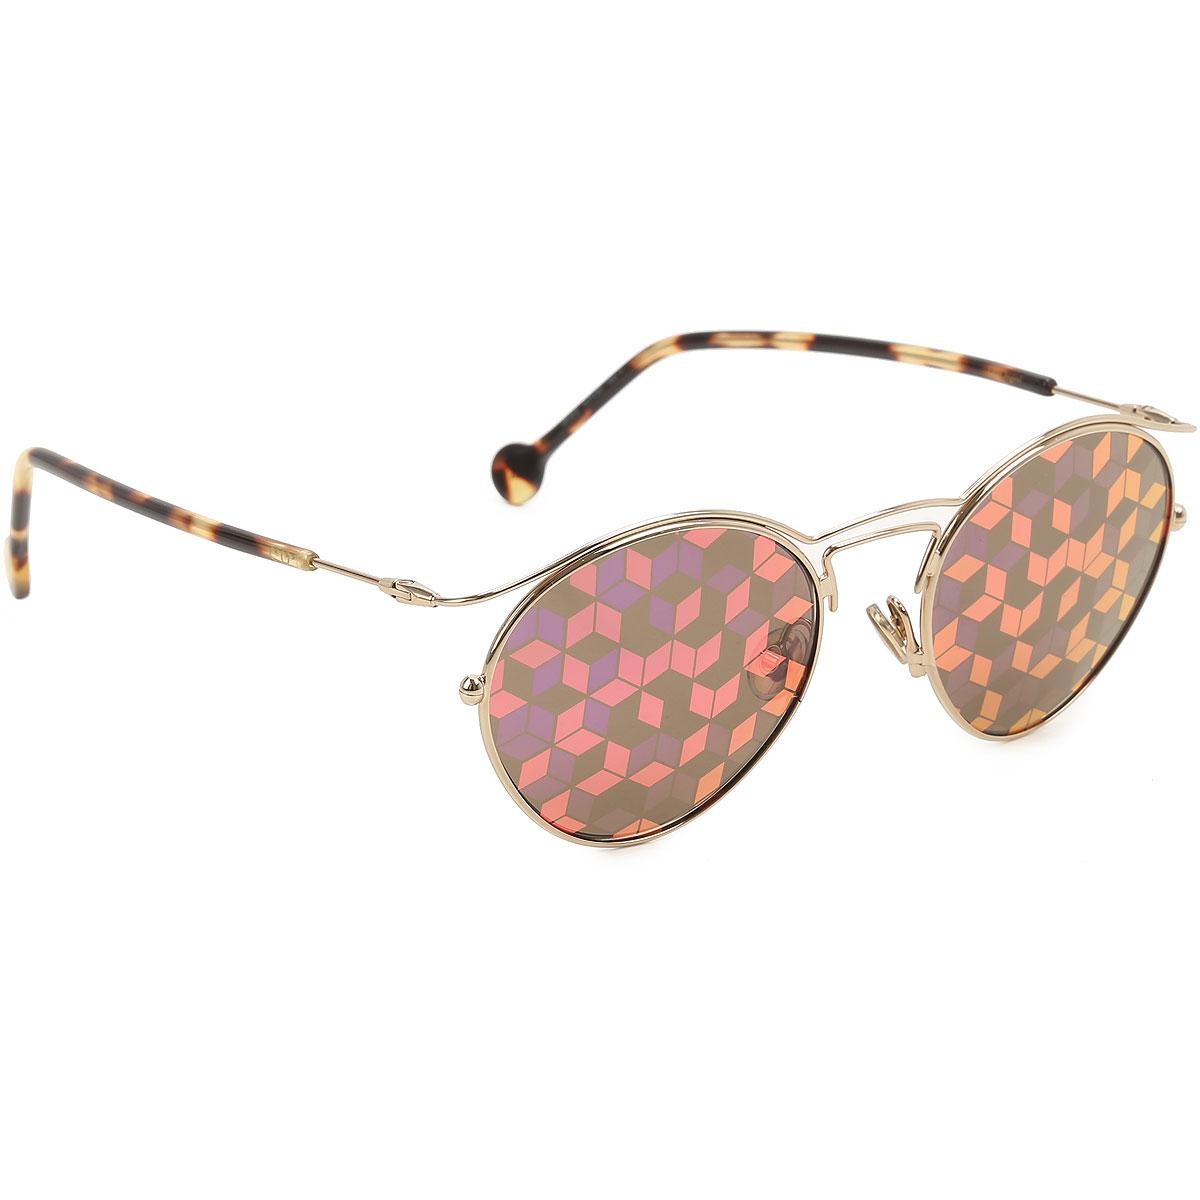 Christian Dior Sunglasses On Sale, Gold, 2019